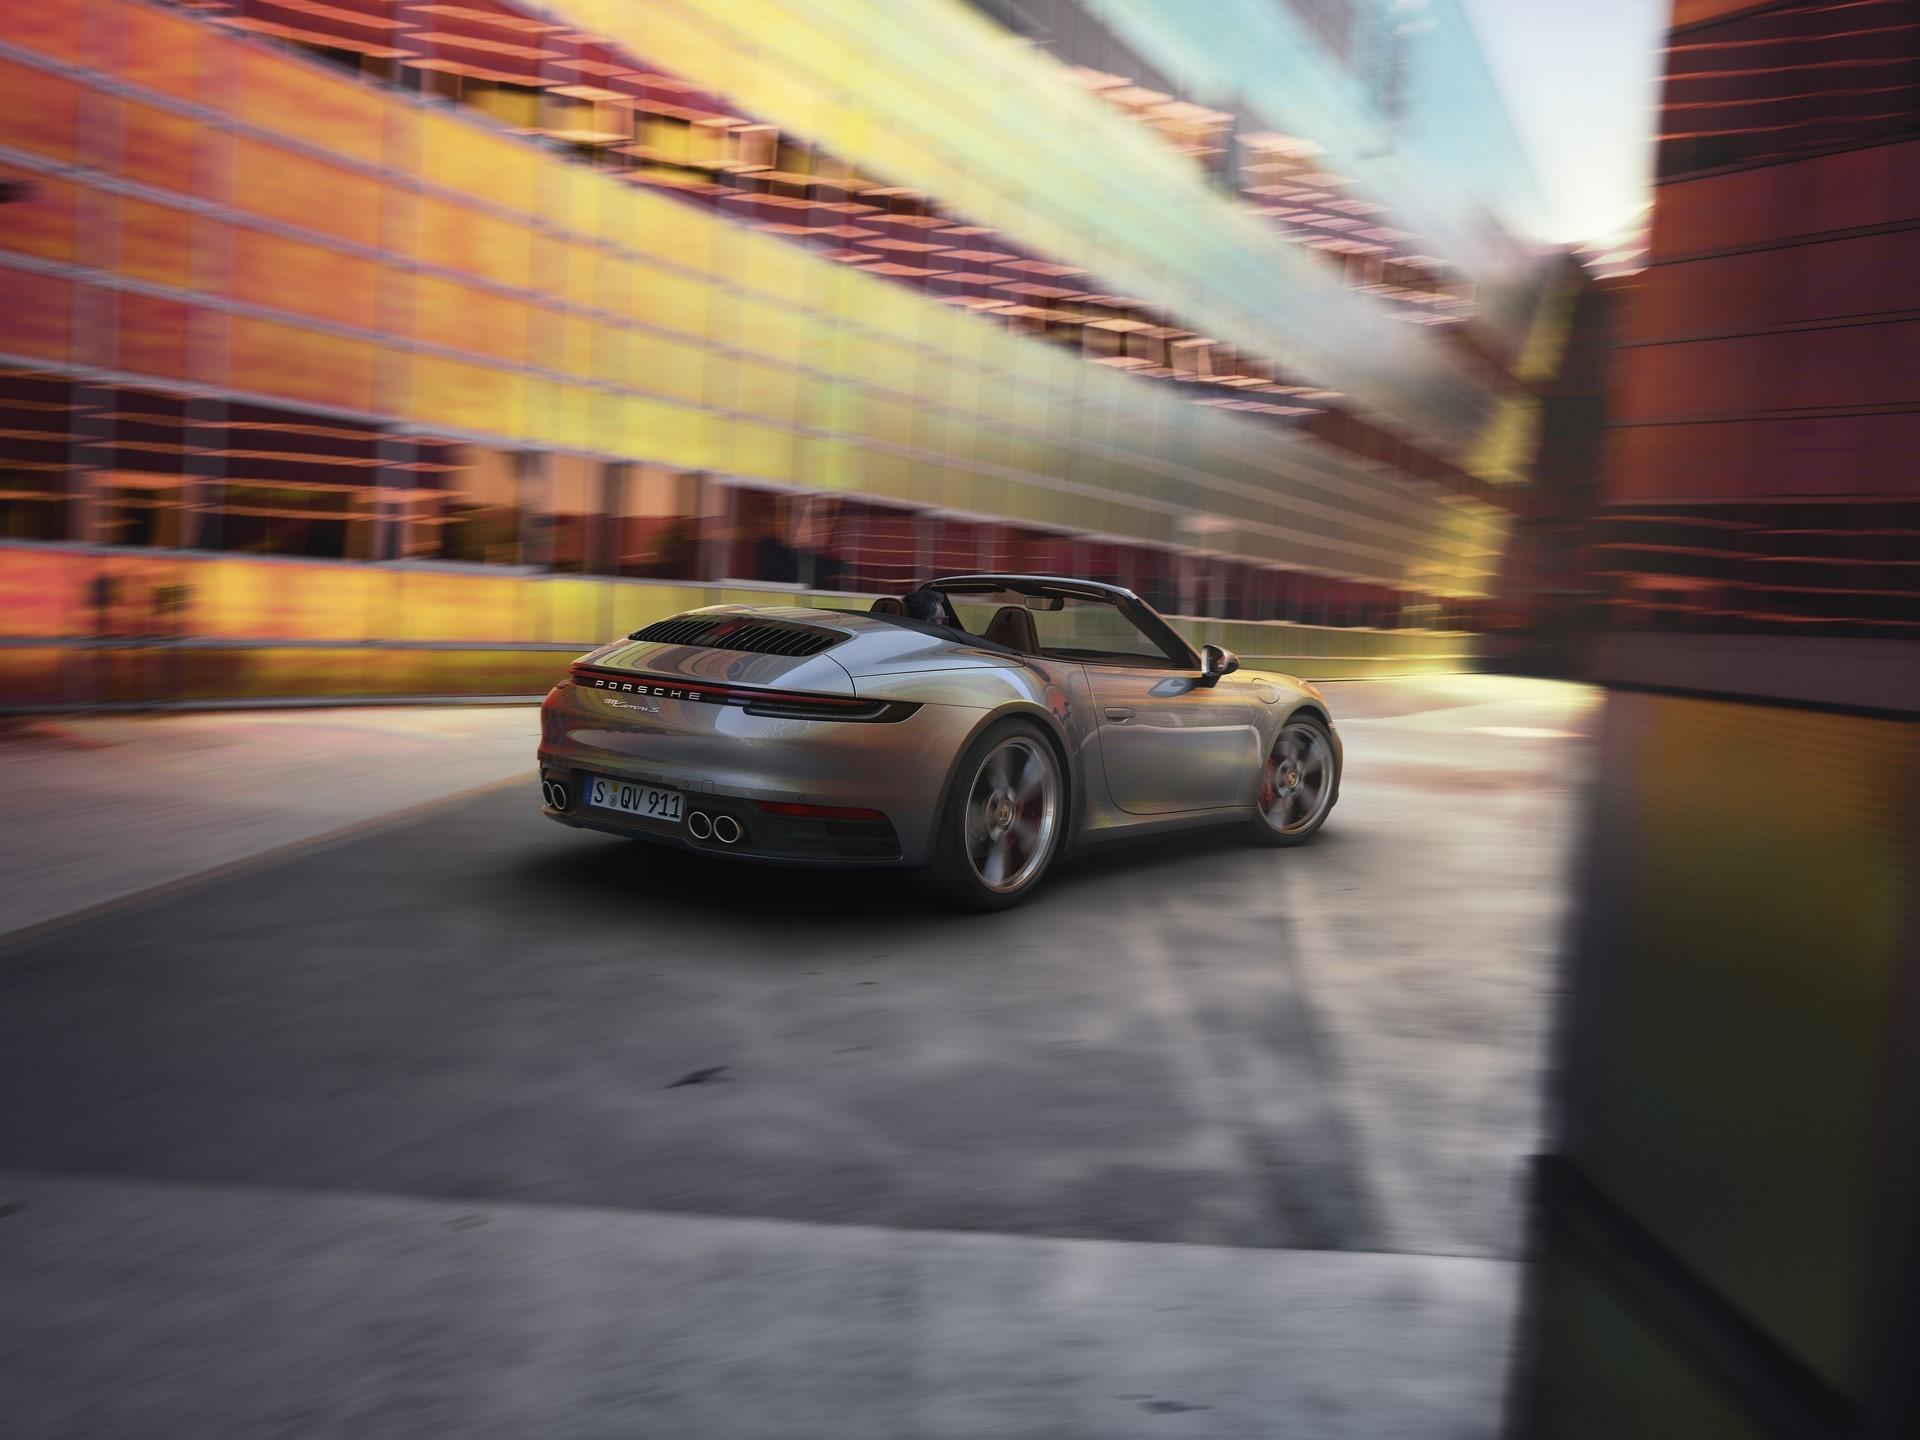 Porsche 911 Cabriolet 2019 (7)